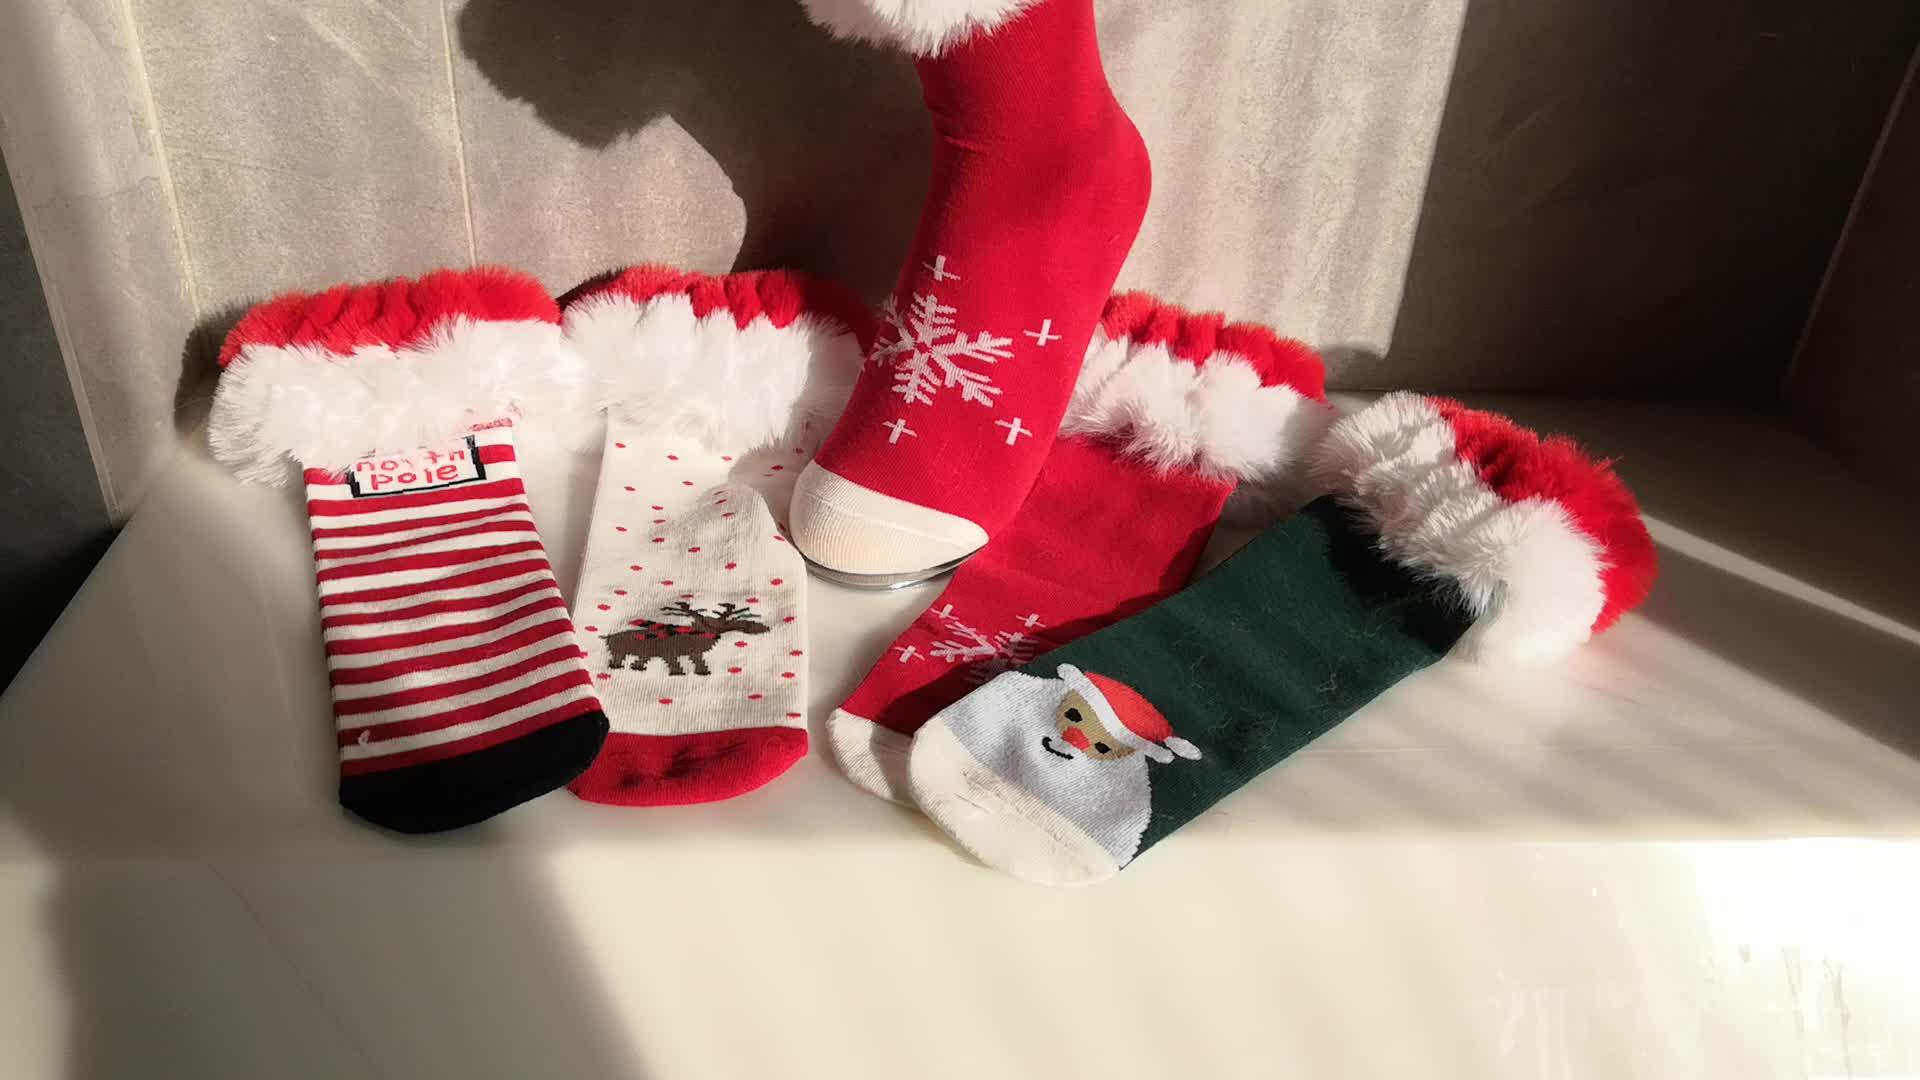 Christmas Snowflake Santa clause วันแม่ฝ้ายคริสต์มาส Boot ถุงเท้าขนสัตว์